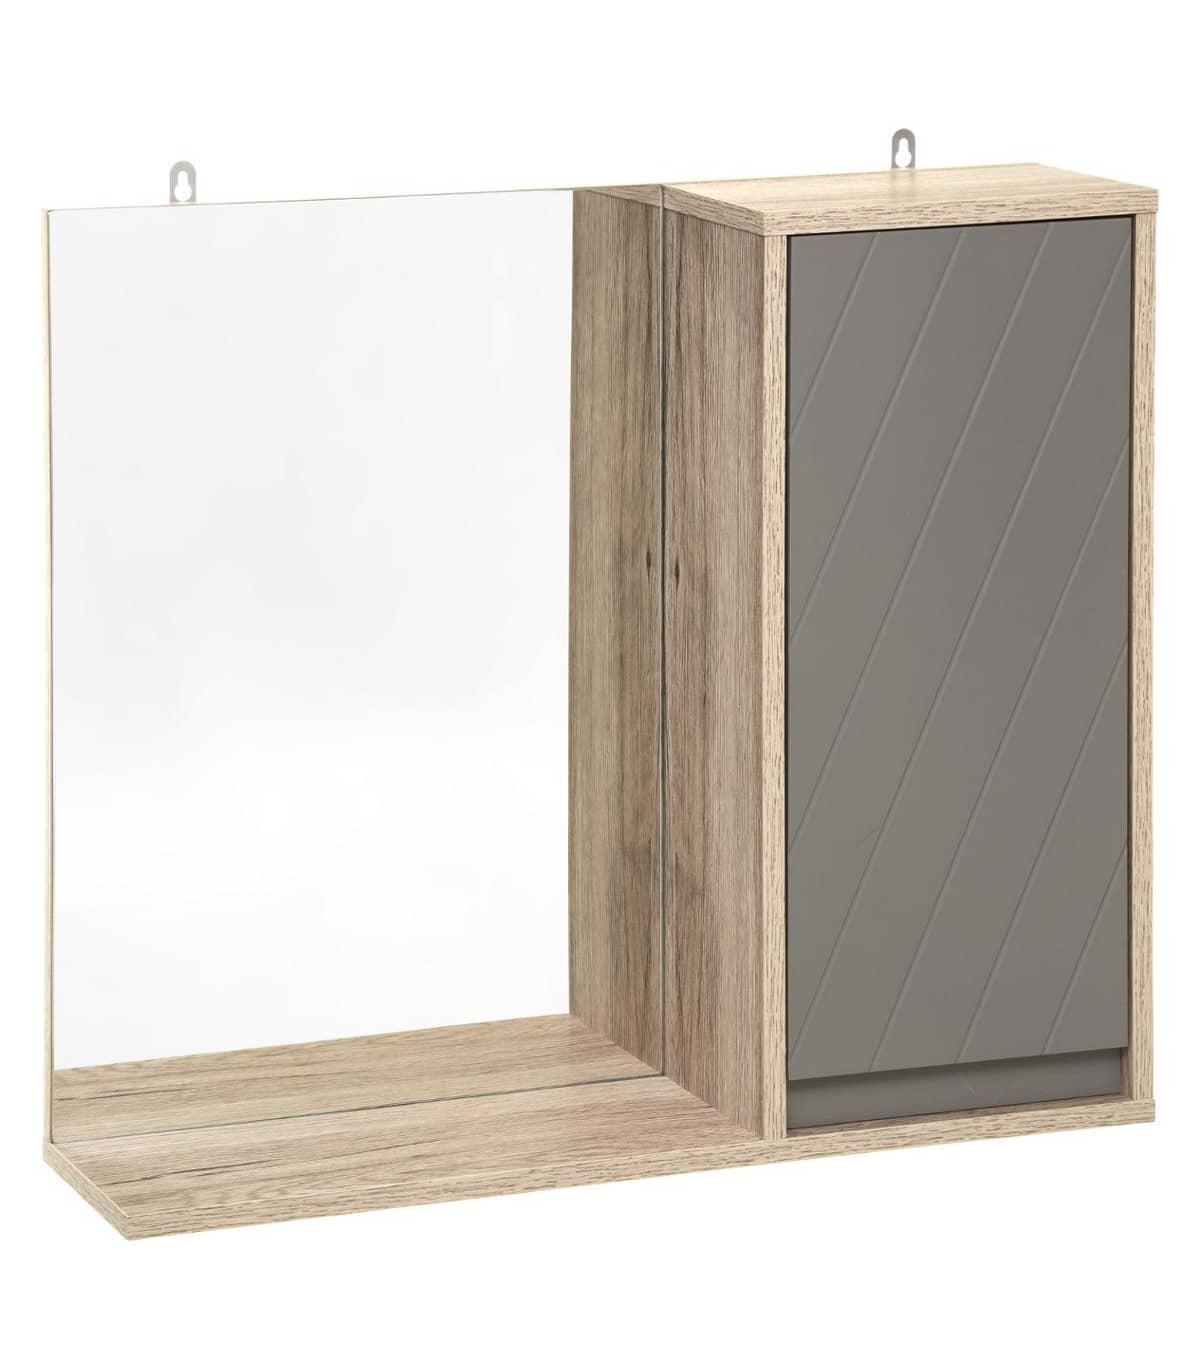 4goodz MDF Spiegelkastje Elda 57x14,5x49 cm - Grijs